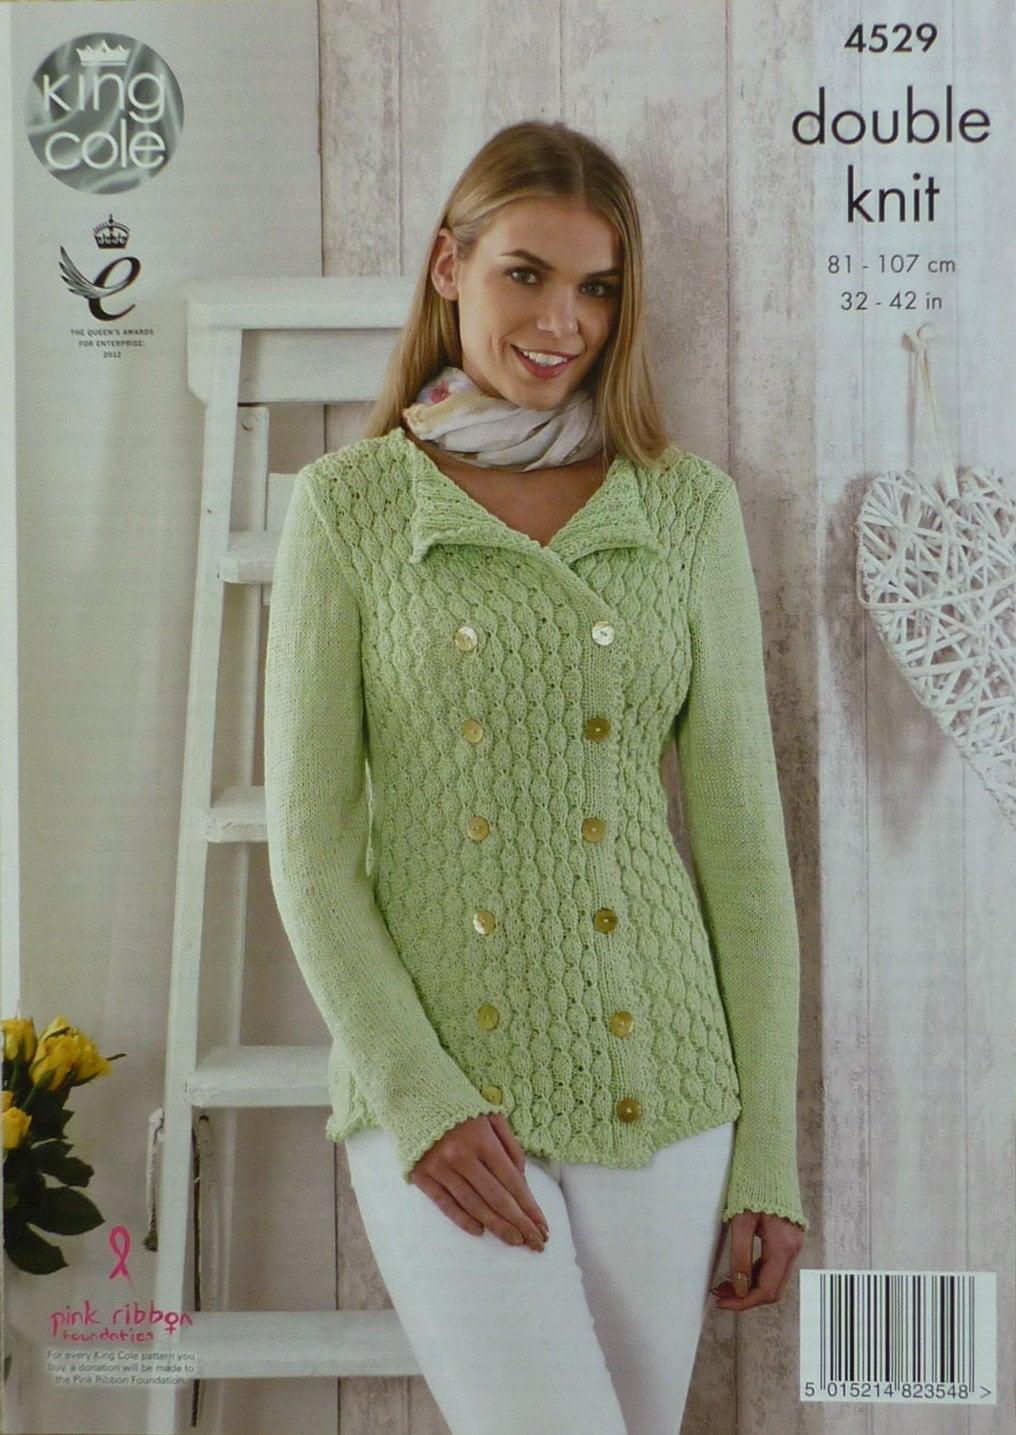 Short Round Knitting Needles